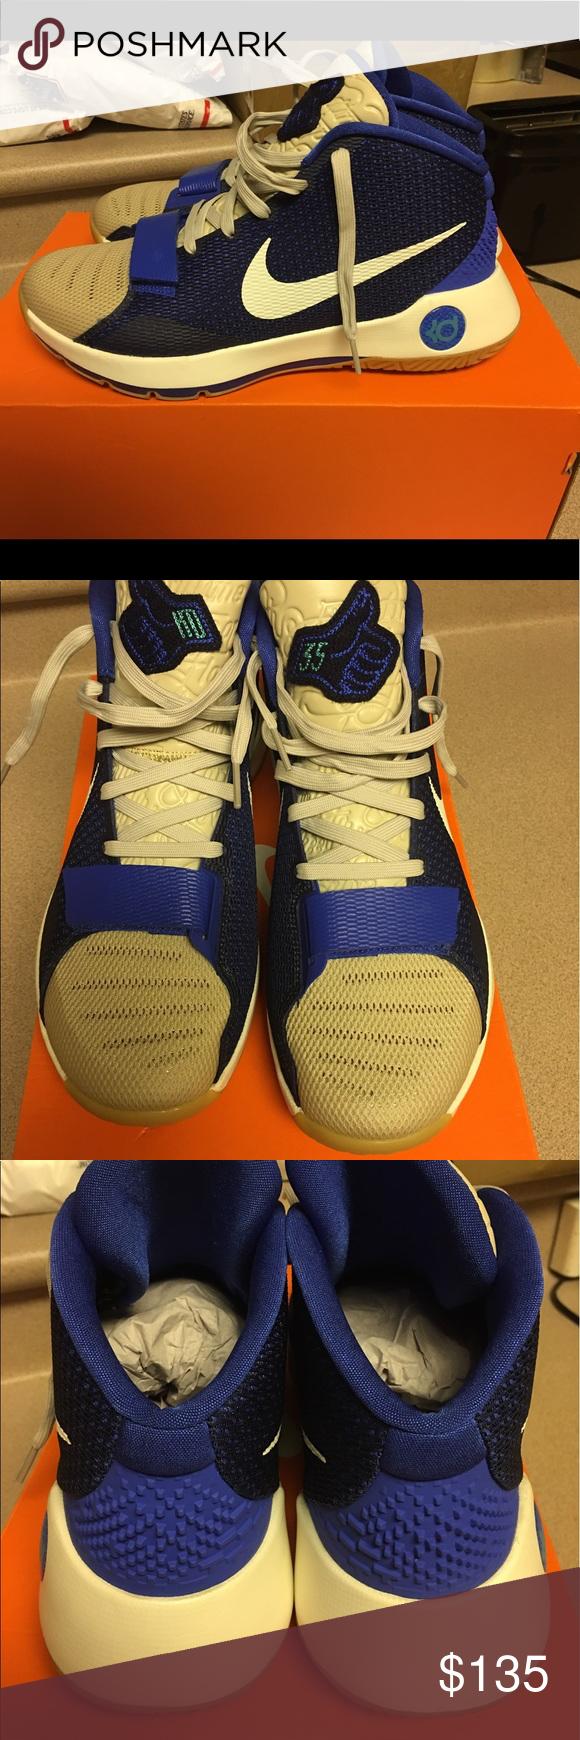 789d5cd9b48 NIKE MEN S KD DURANT TREY 5 III LMTD SHOES SIZE 10 BRAND NEW NIKE MEN S KD  DURANT TREY 5 III LMTD BASKETBALL SHOES 812558 442 SIZE 10 Nike Shoes  Sneakers